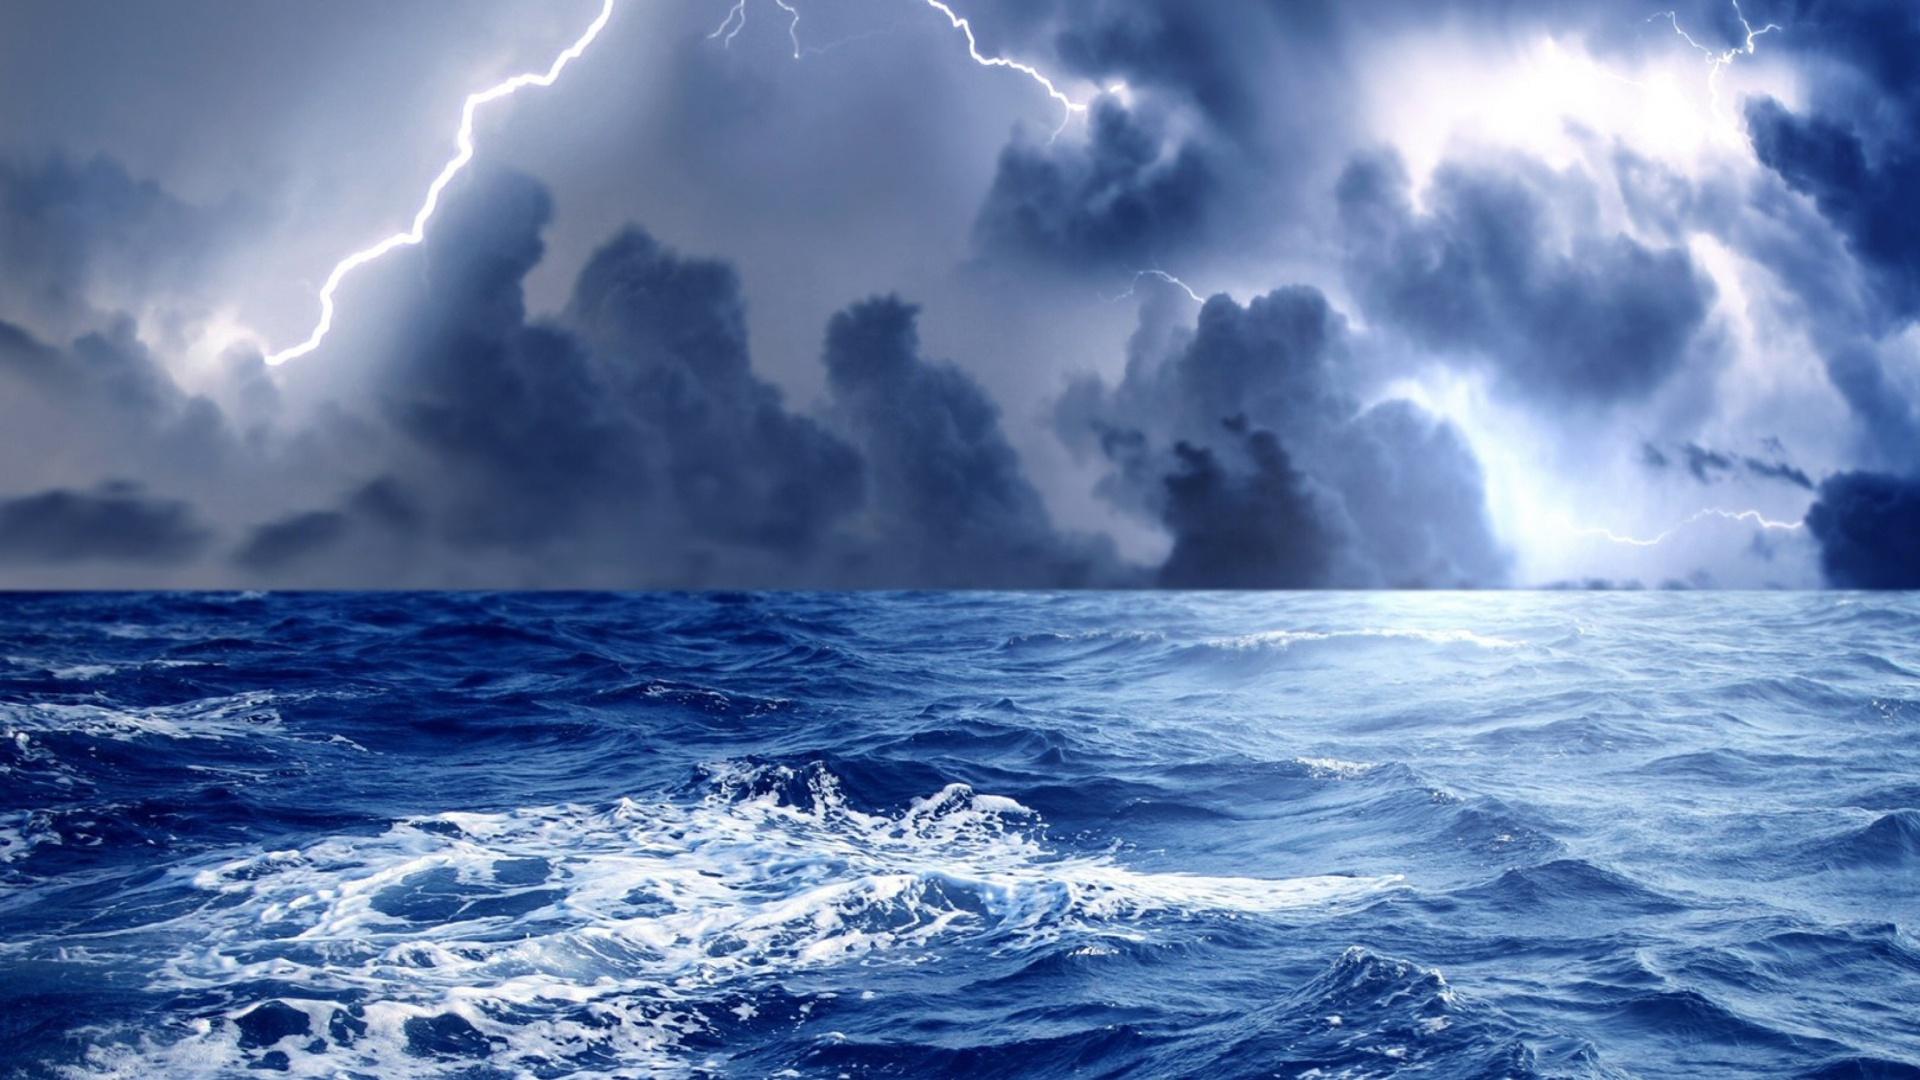 Storm Lightning 1920x1080 Screensaver wallpaper 1920x1080